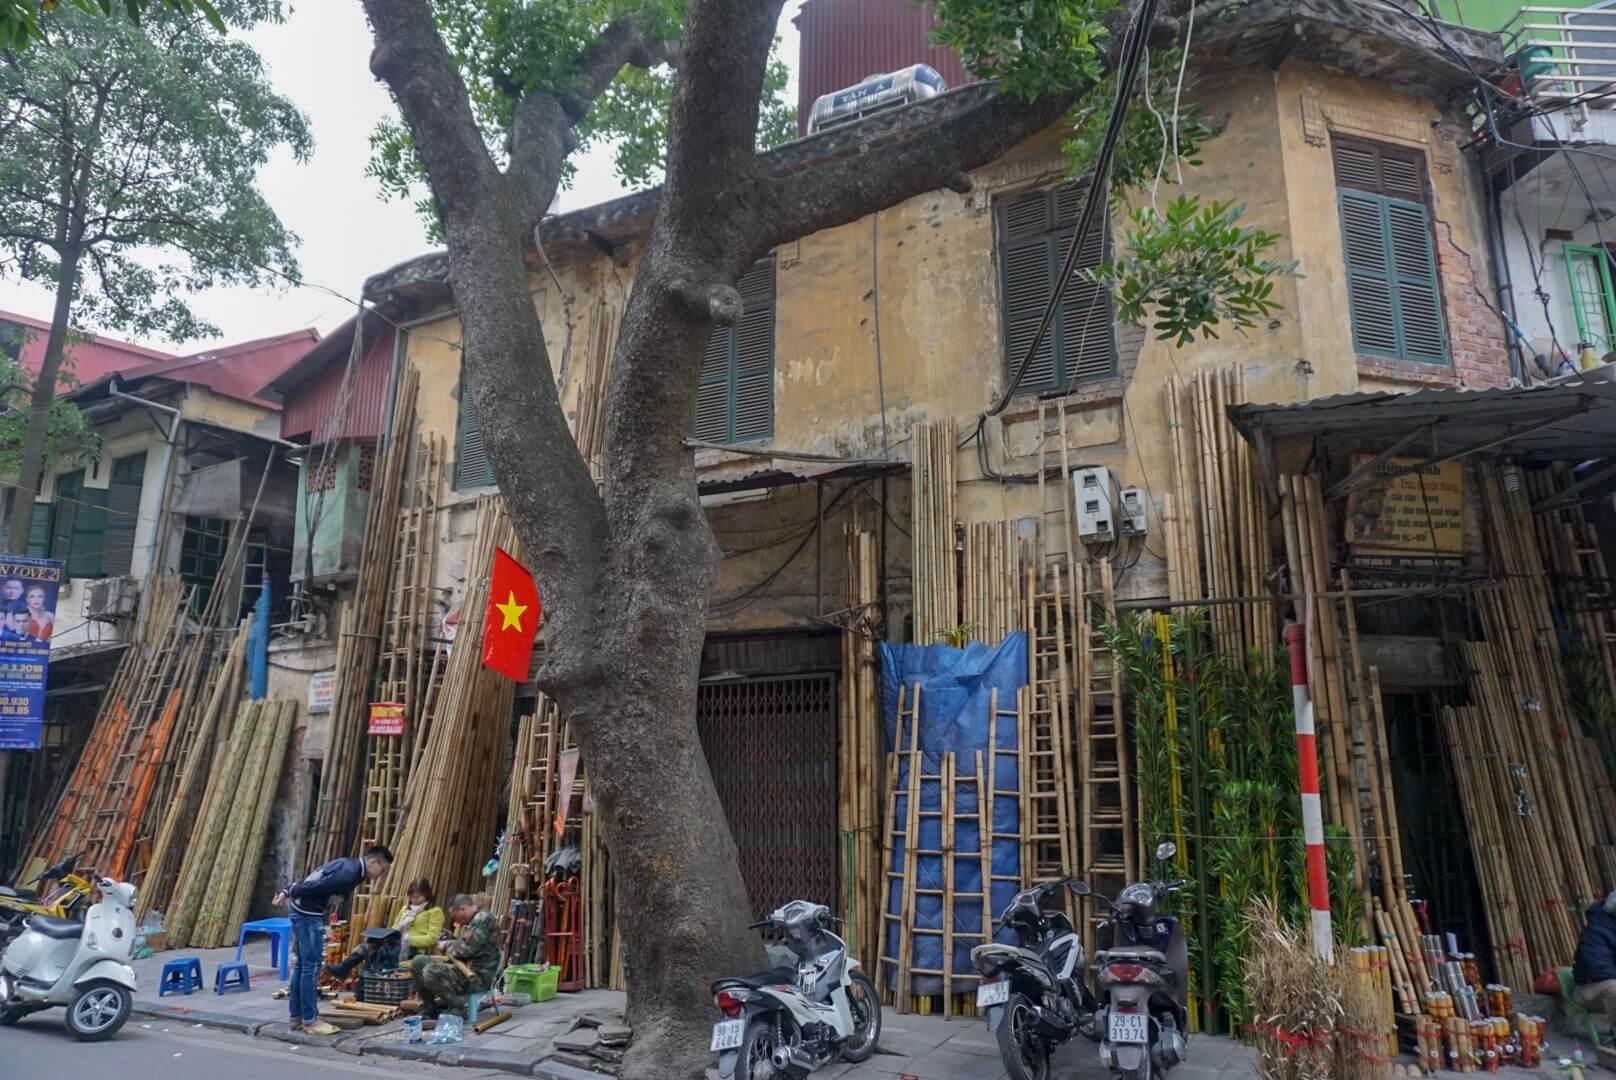 Vieille ville Hanoi quartier Vietnam